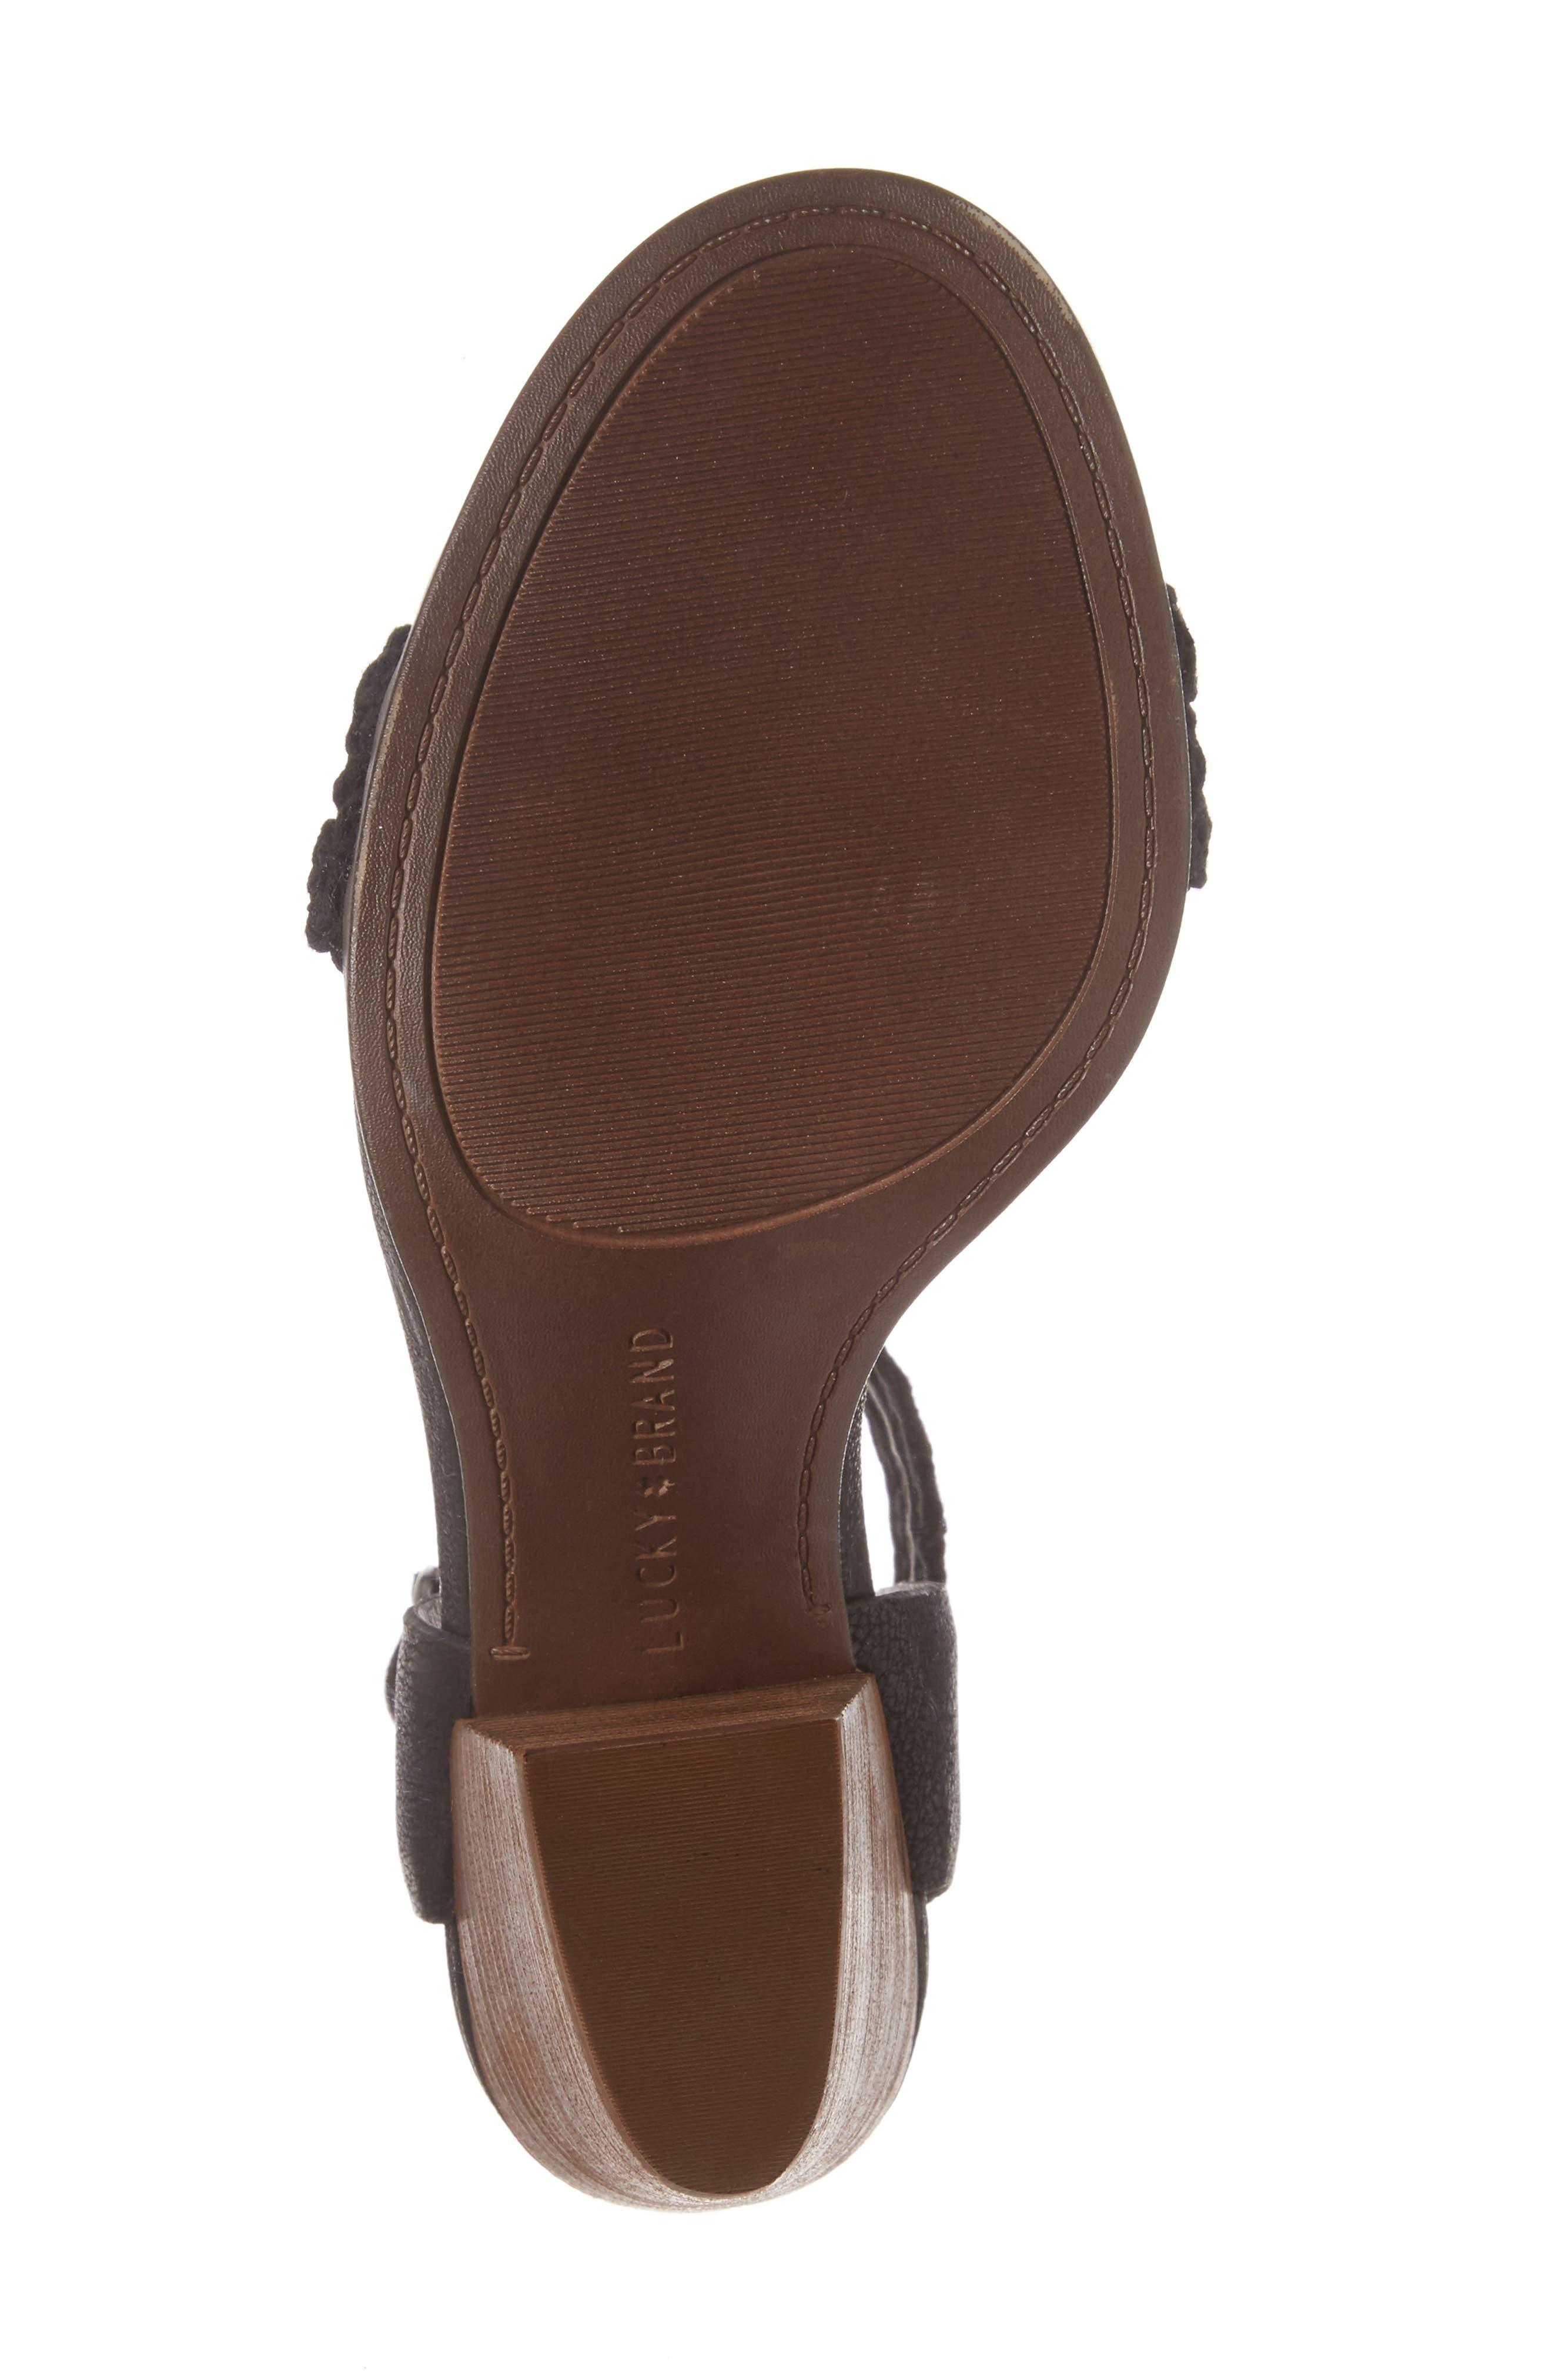 Oakes Ankle Strap Sandal,                             Alternate thumbnail 6, color,                             Black Leather